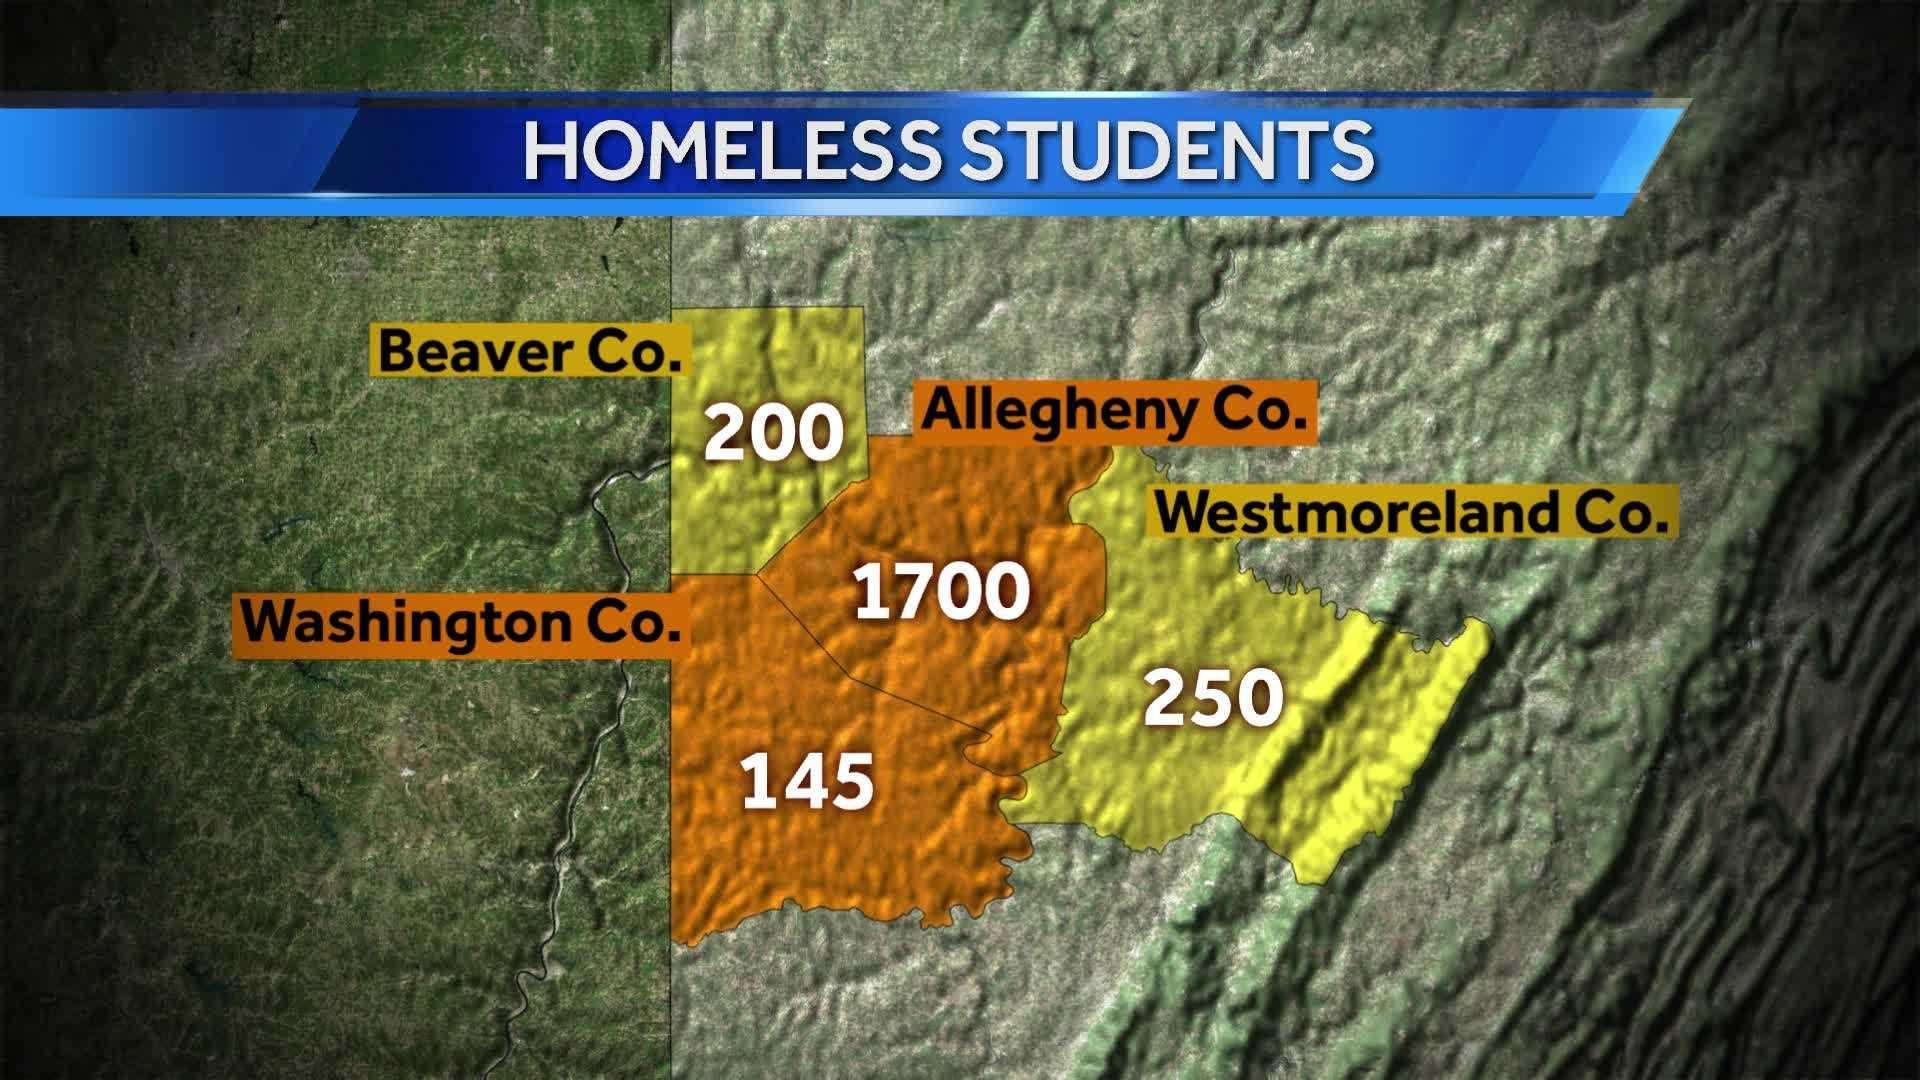 img-homeless students